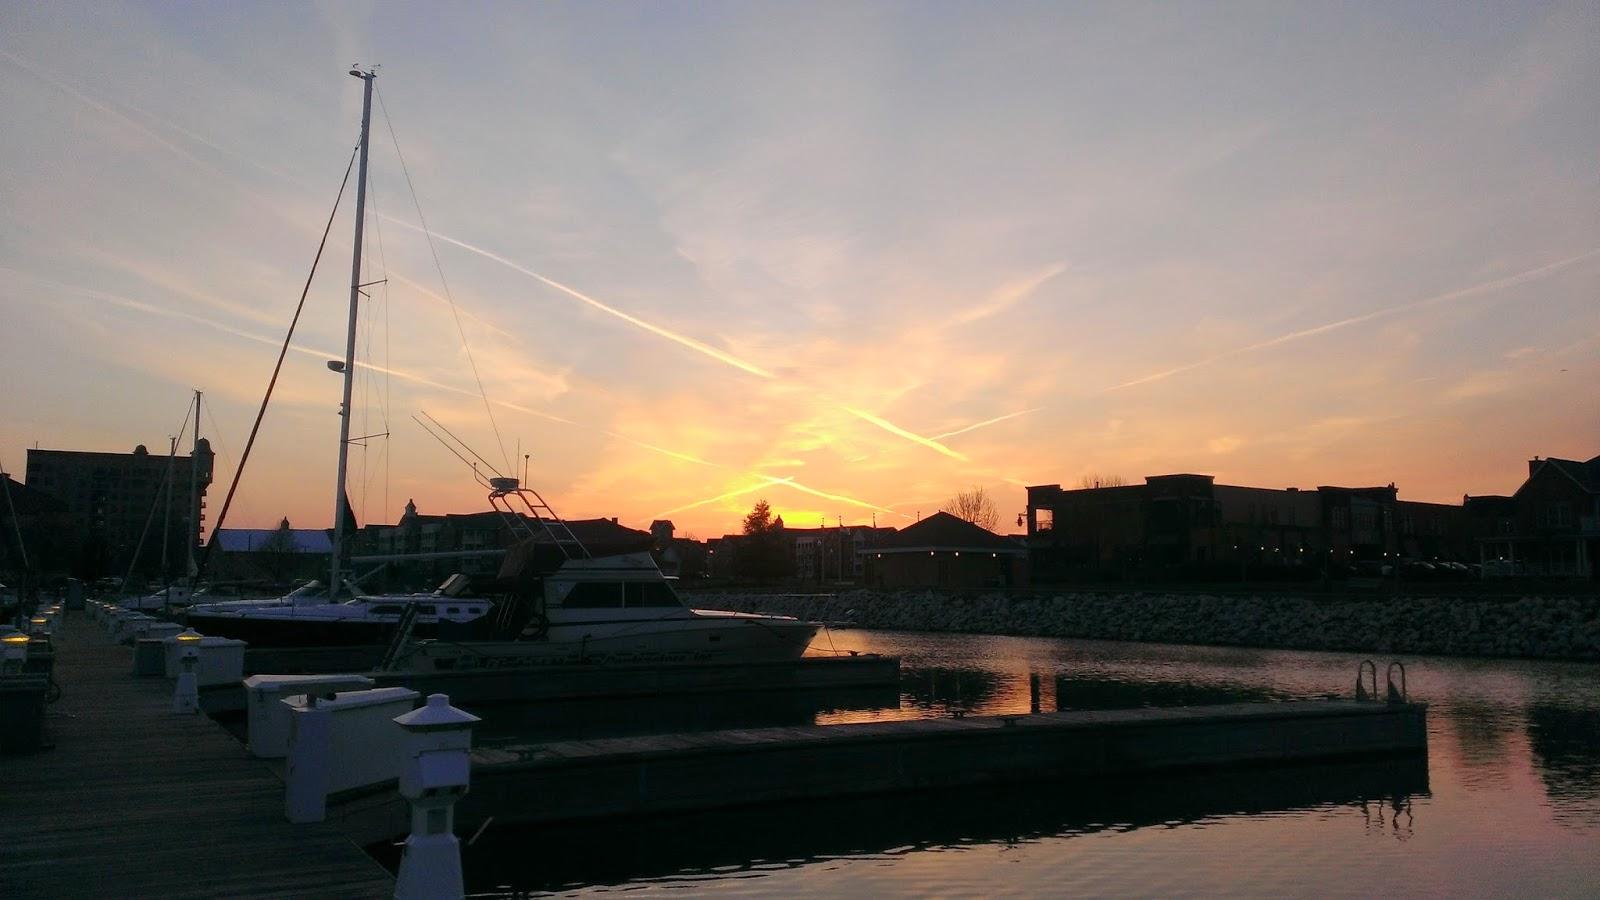 Summer, boats, bucket list